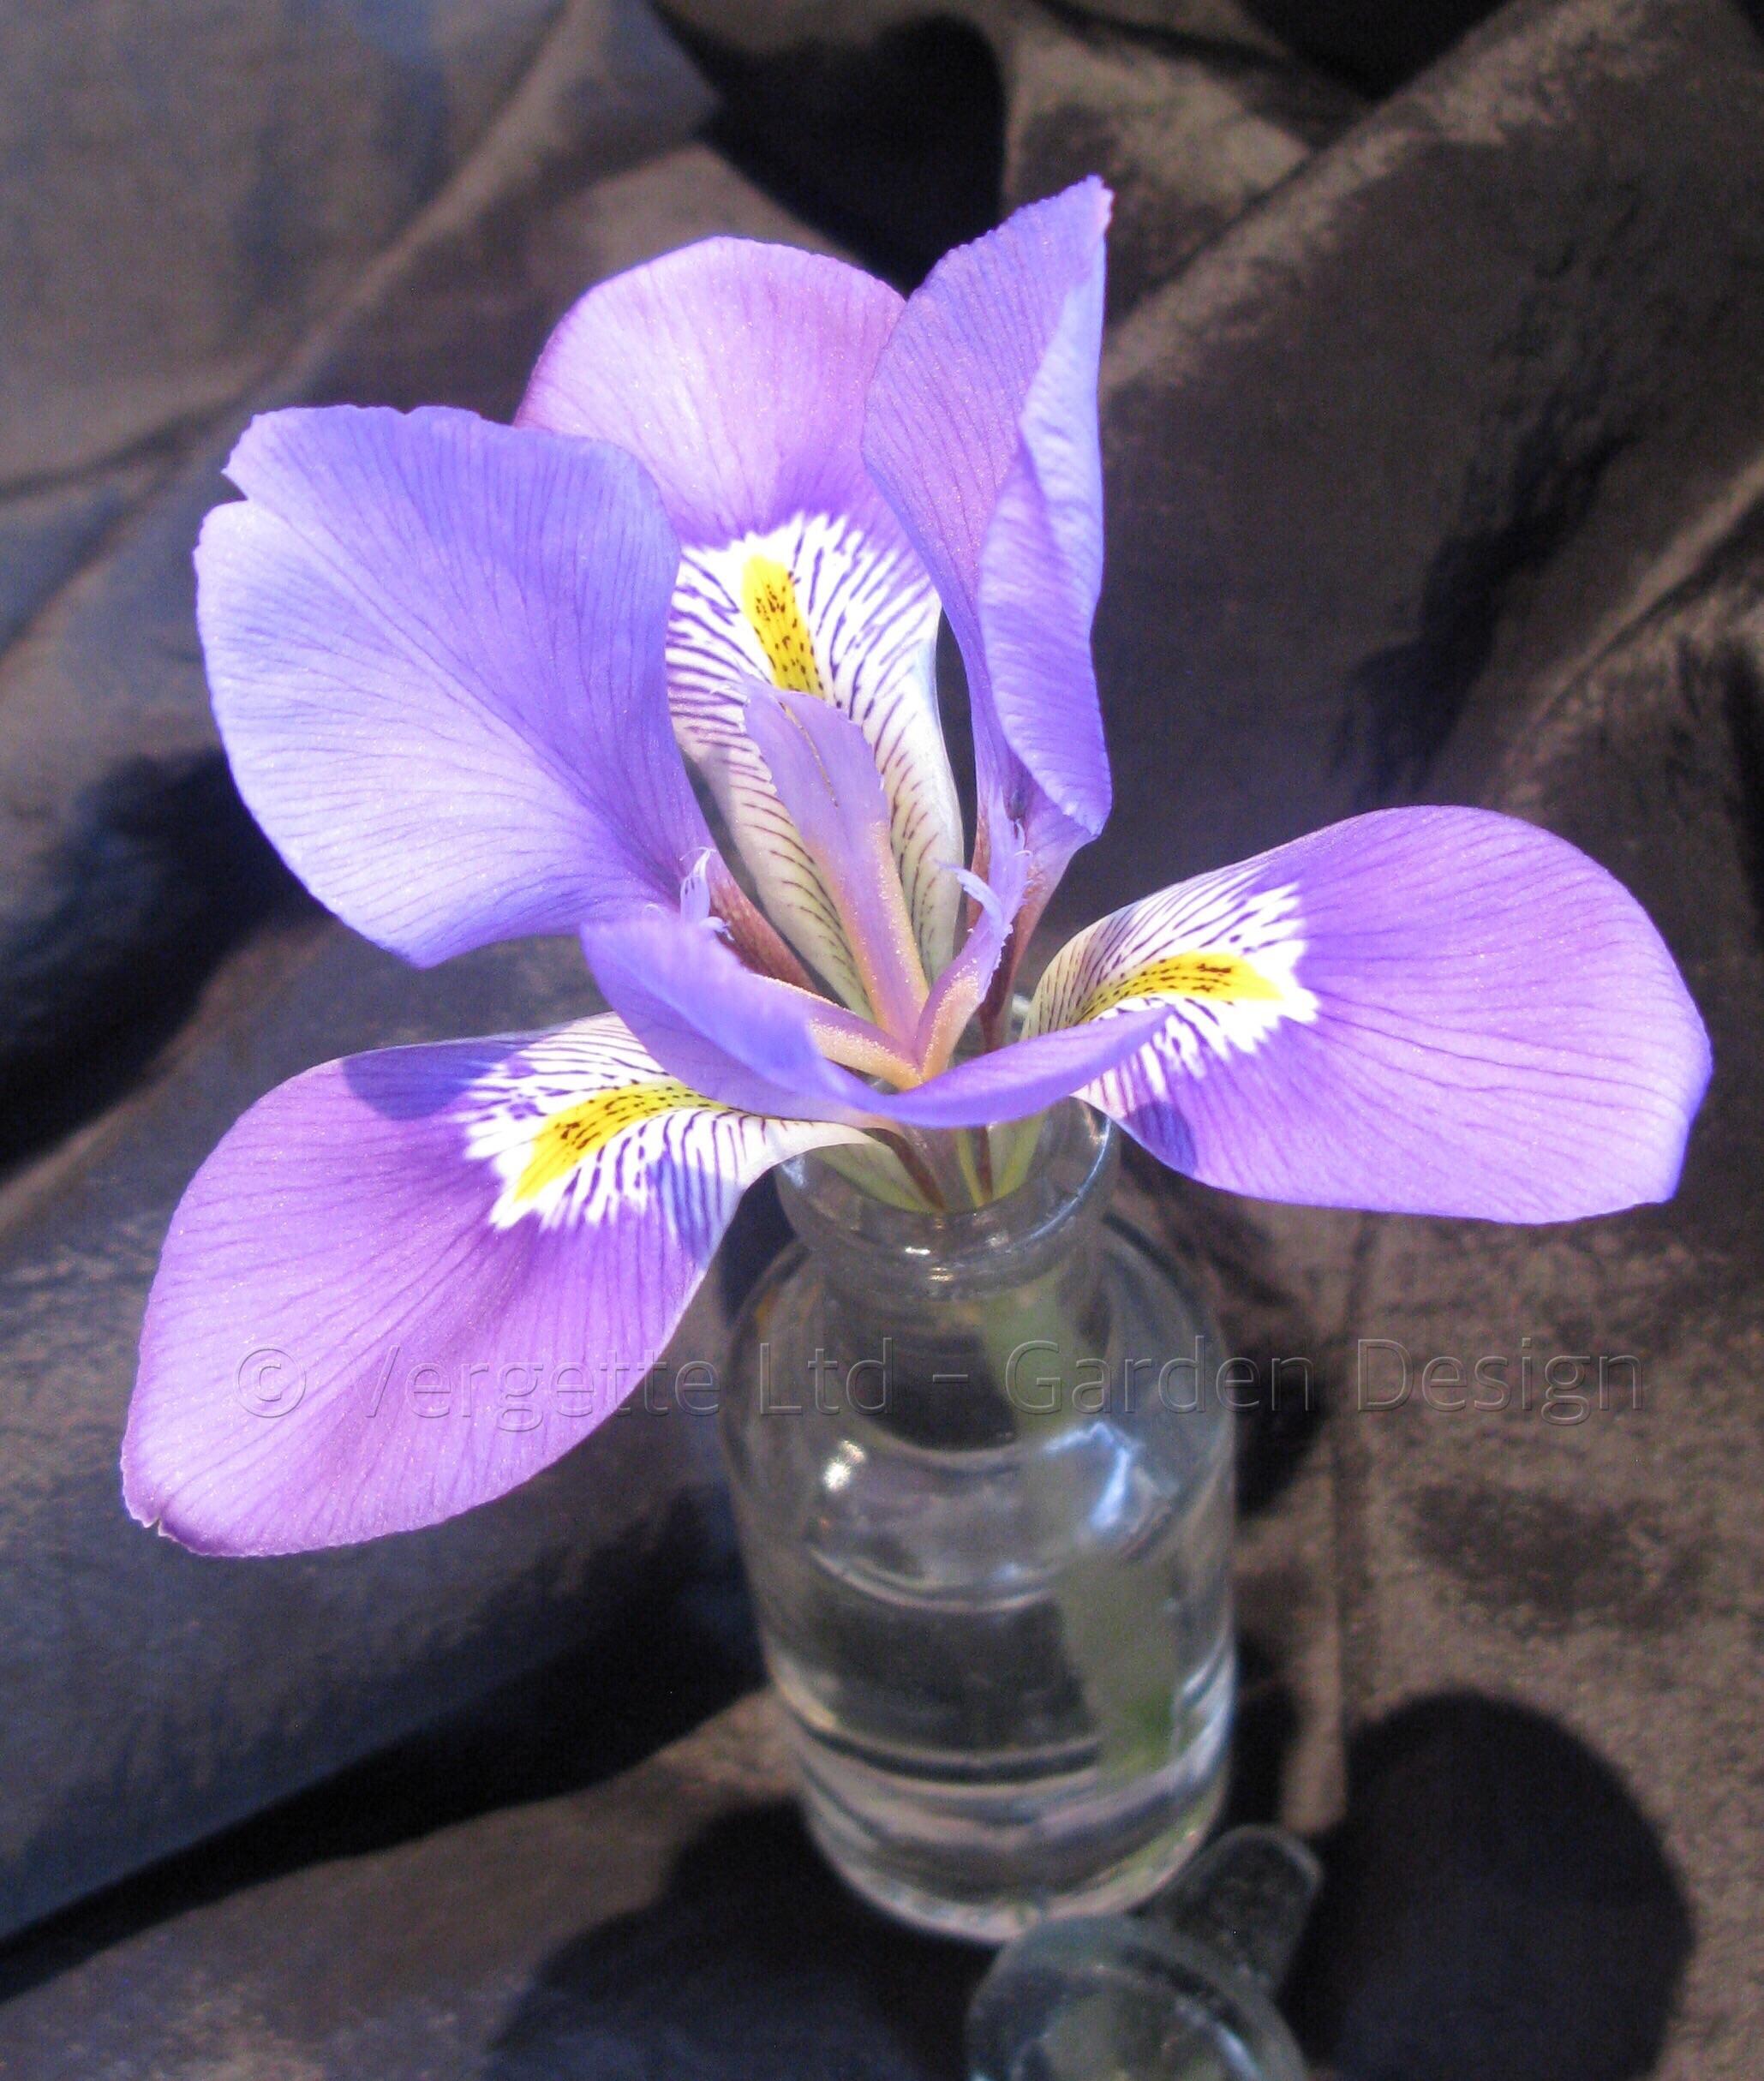 message in a tiny bottle u2013 vergette gardens